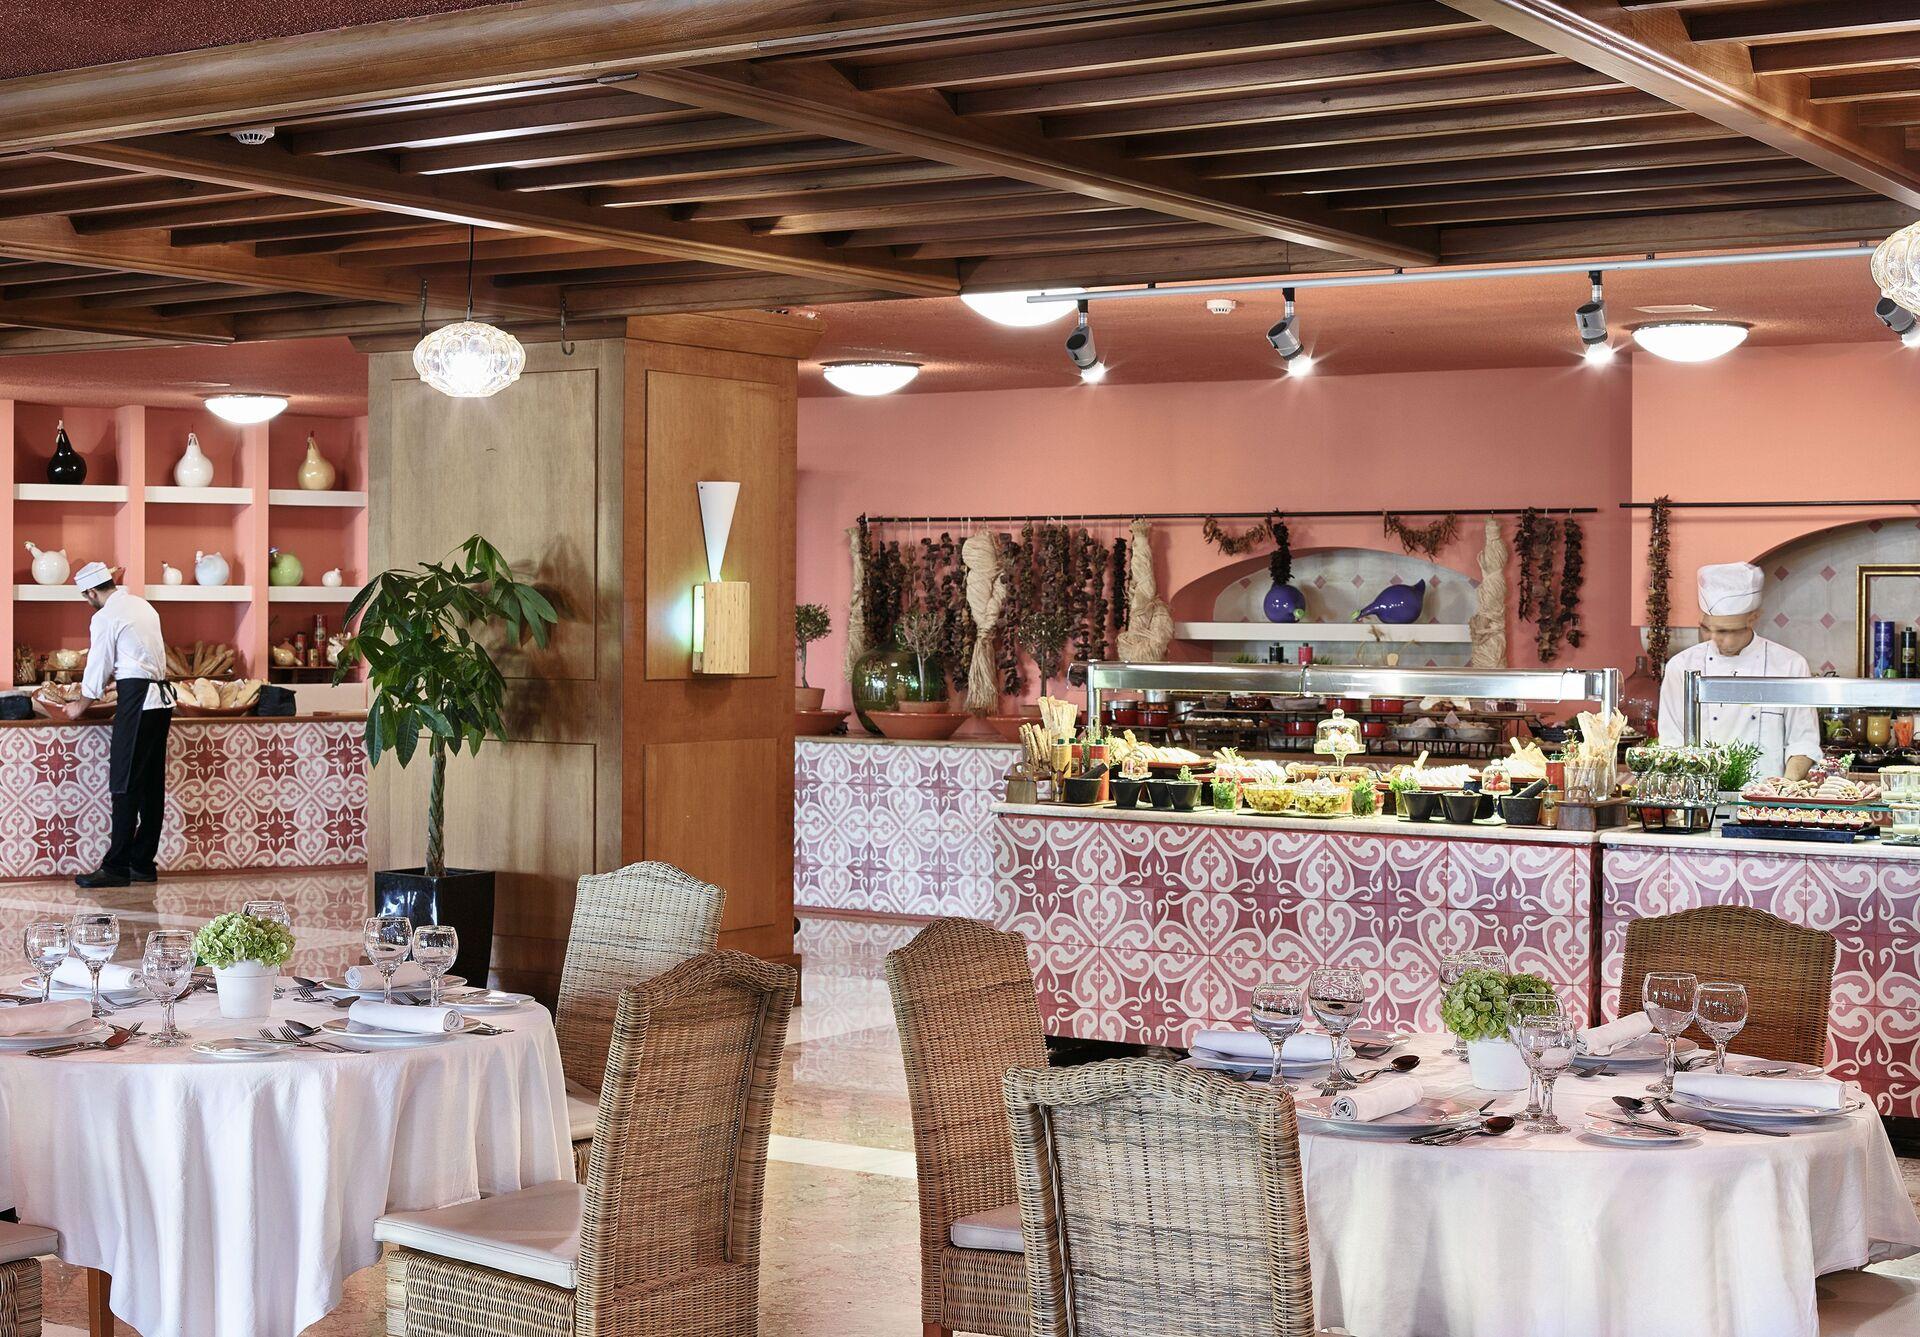 https://cms.satur.sk/data/imgs/tour_image/orig/12-antica-cucina-restaurant_72dpi-1924851.jpg